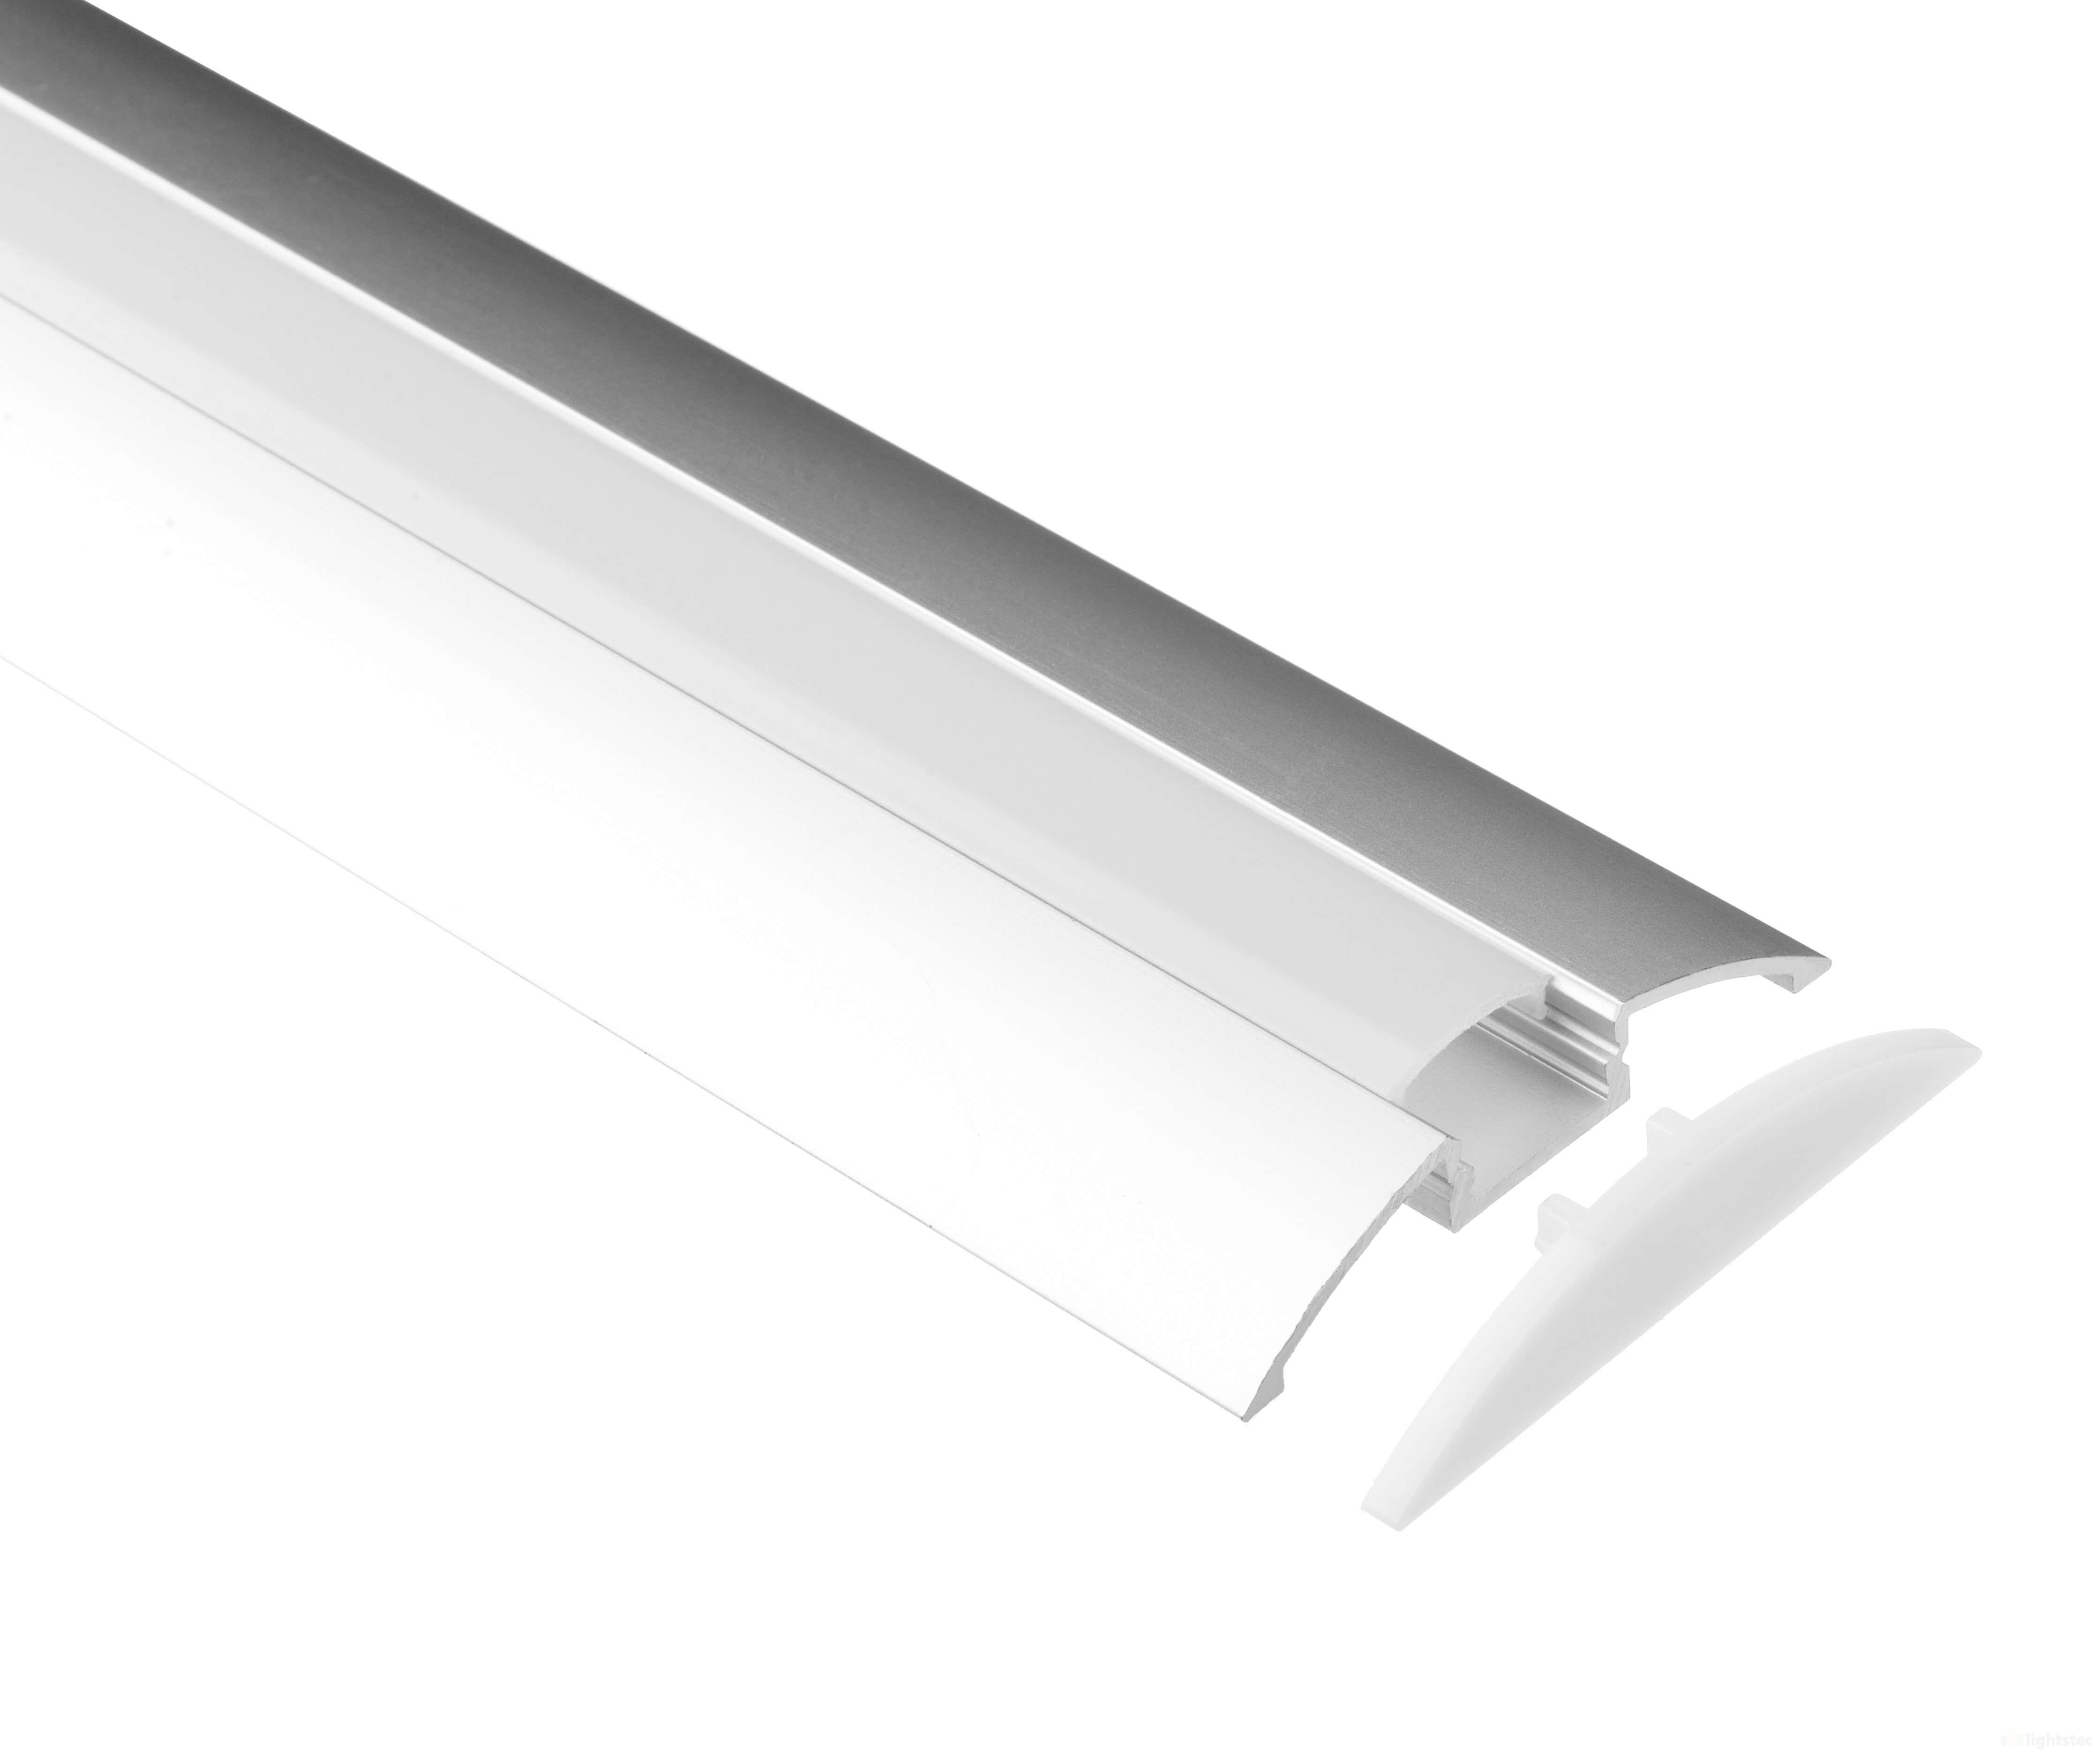 LT-1206 Step Led Aluminum Profiles Extrusion for led strip light - Lightstec